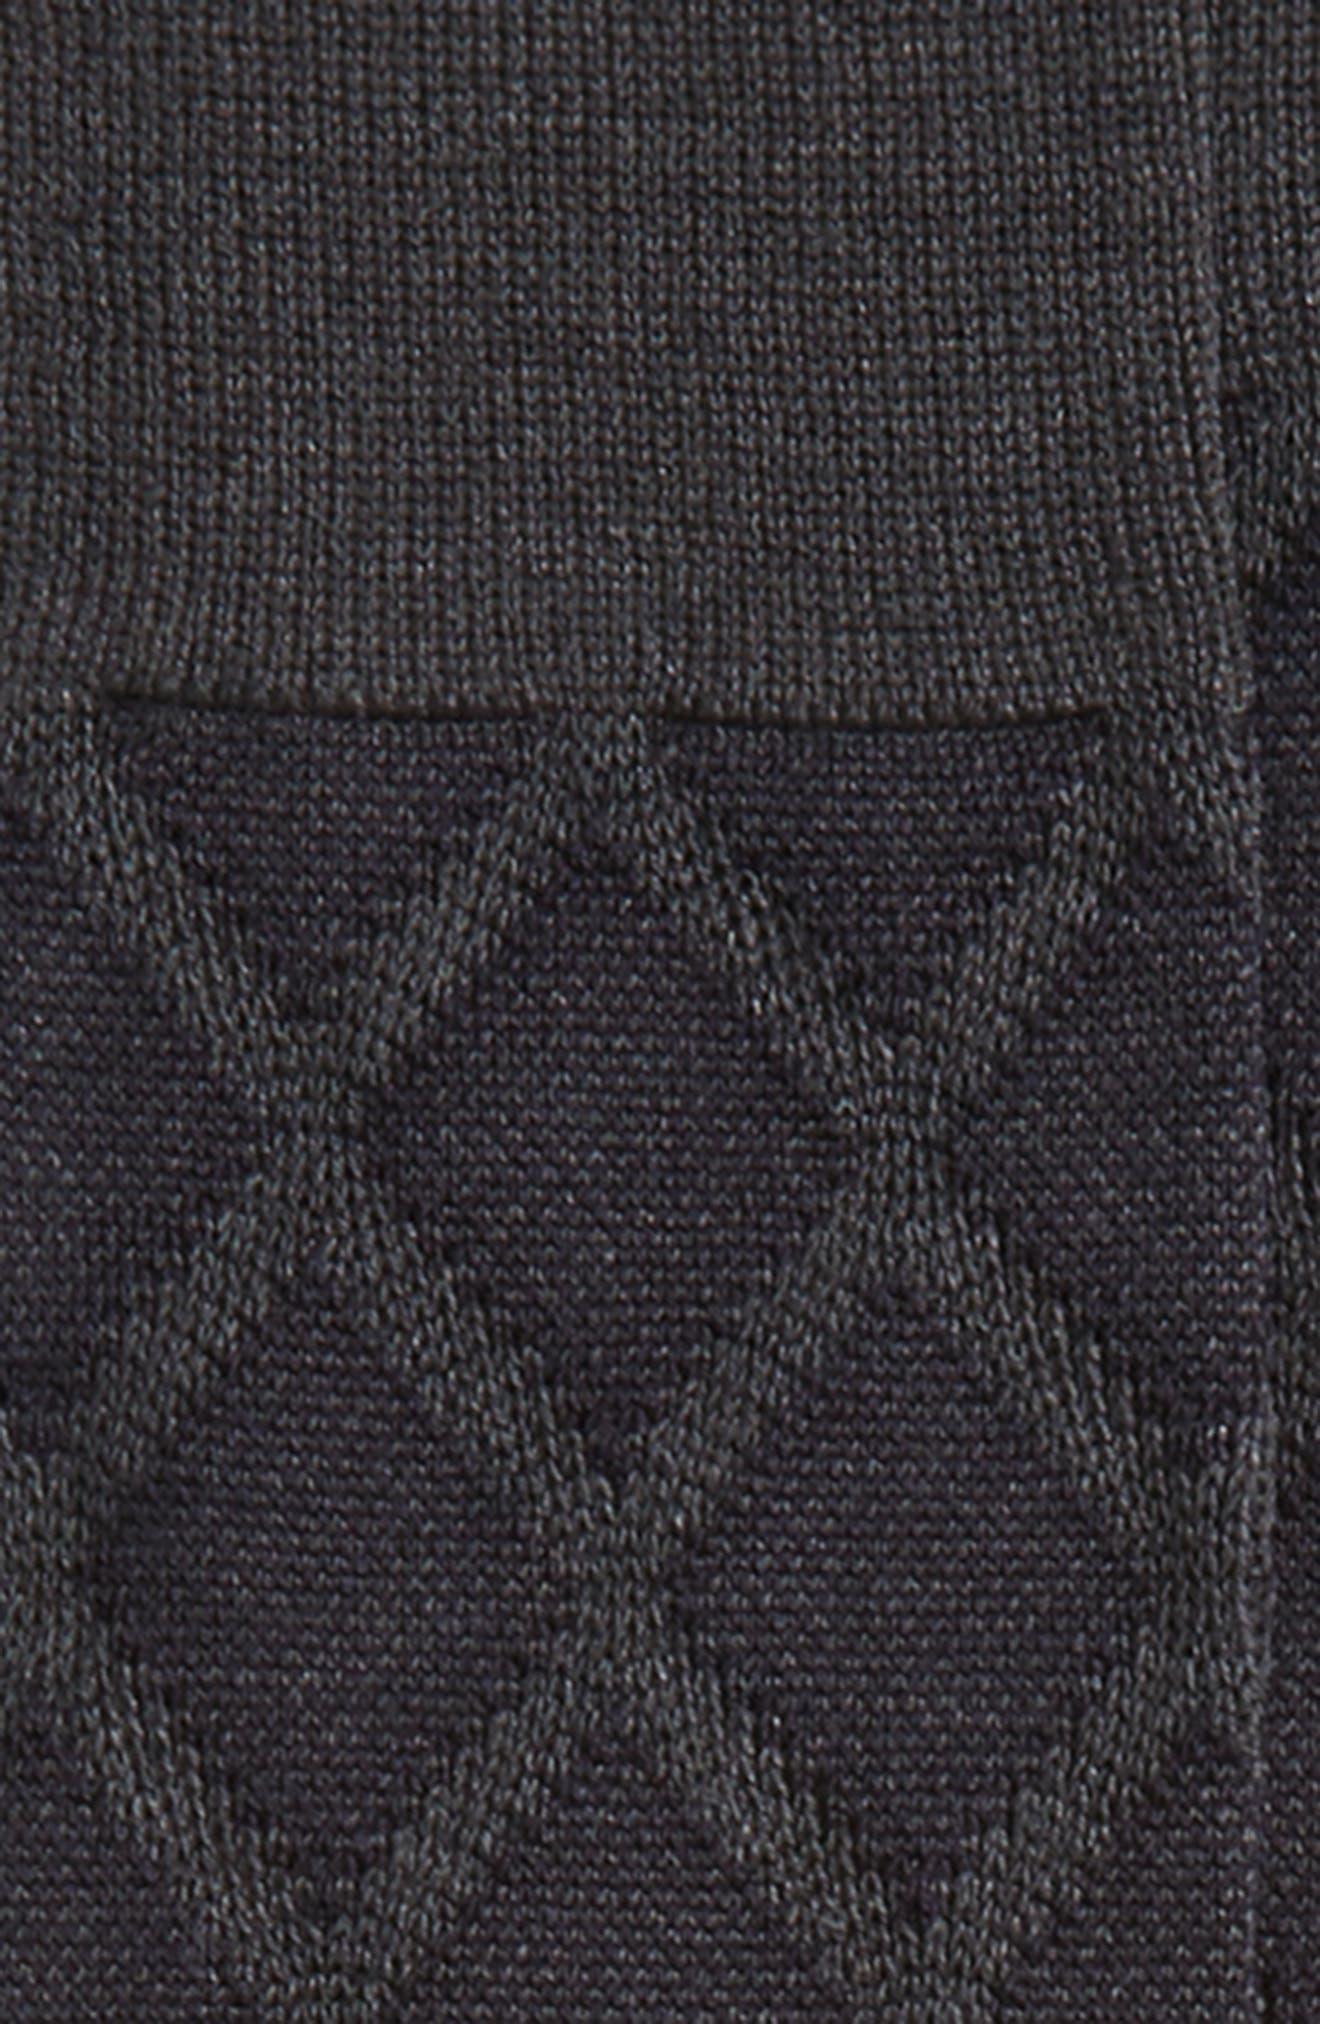 Alternate Image 2  - John W. Nordstrom® Over the Calf Diamond Socks